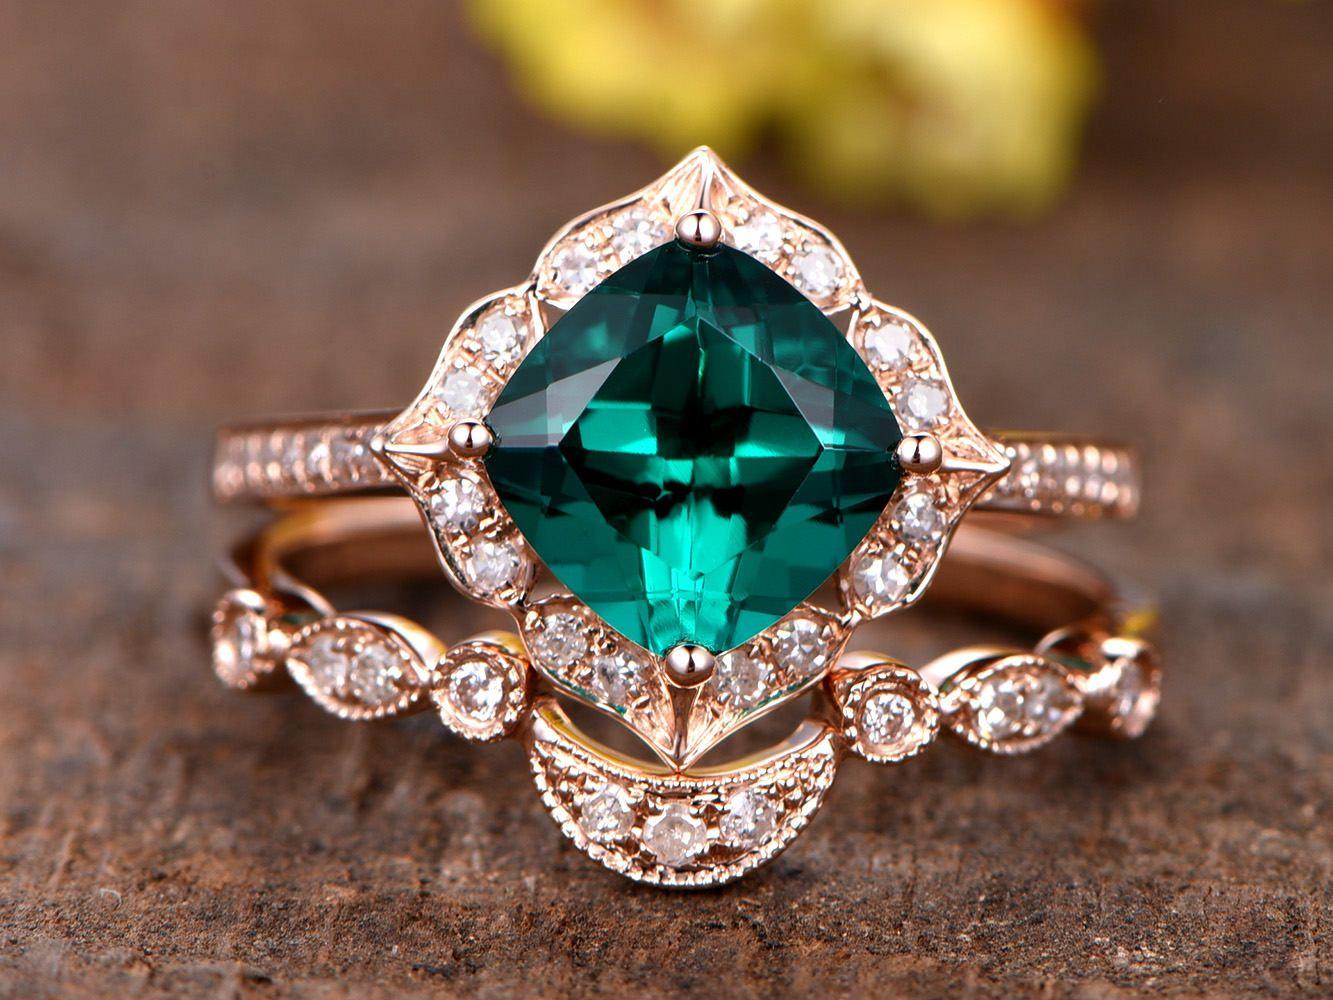 1.3ct Emerald Engagement Ring Vintage Floral Diamond